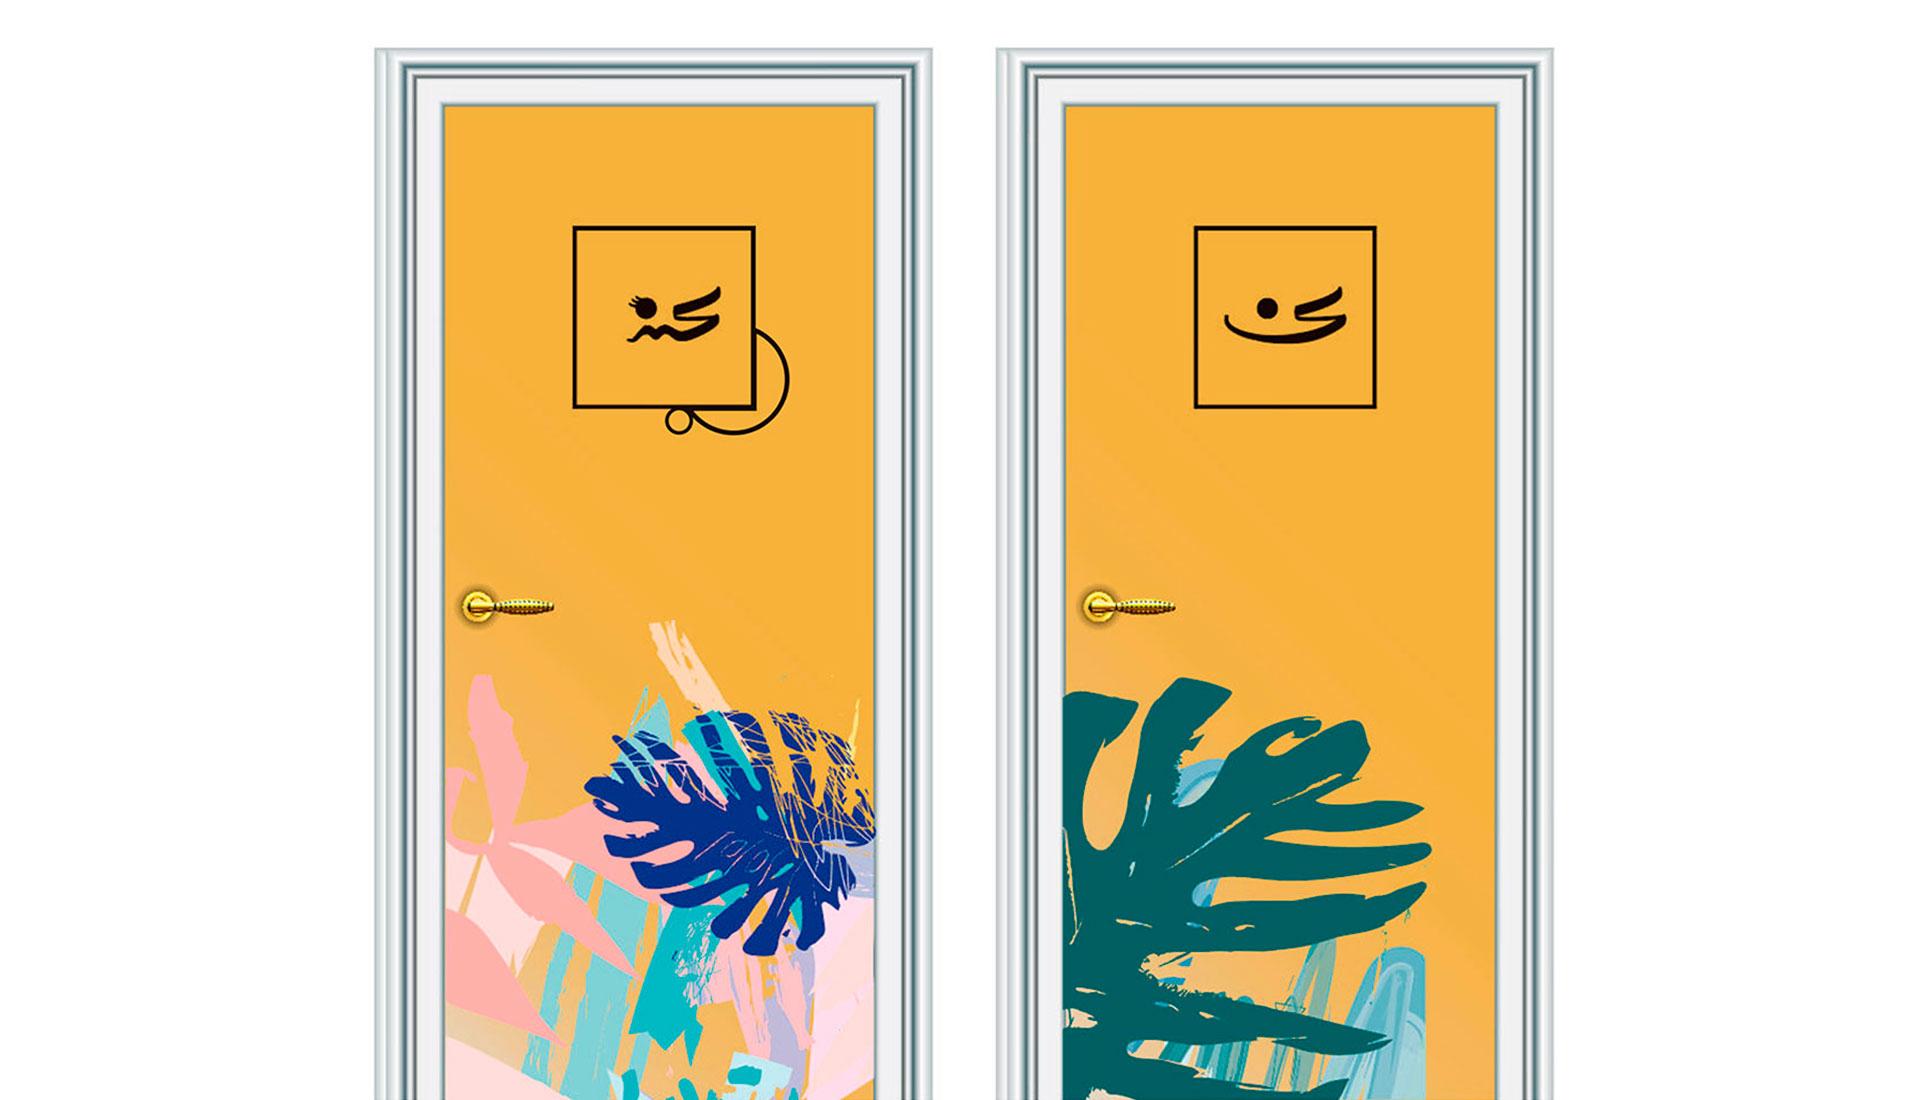 agencia-pennyworth-marketing-digital-identidad-corporativa-branding-restaurante-valencia-11